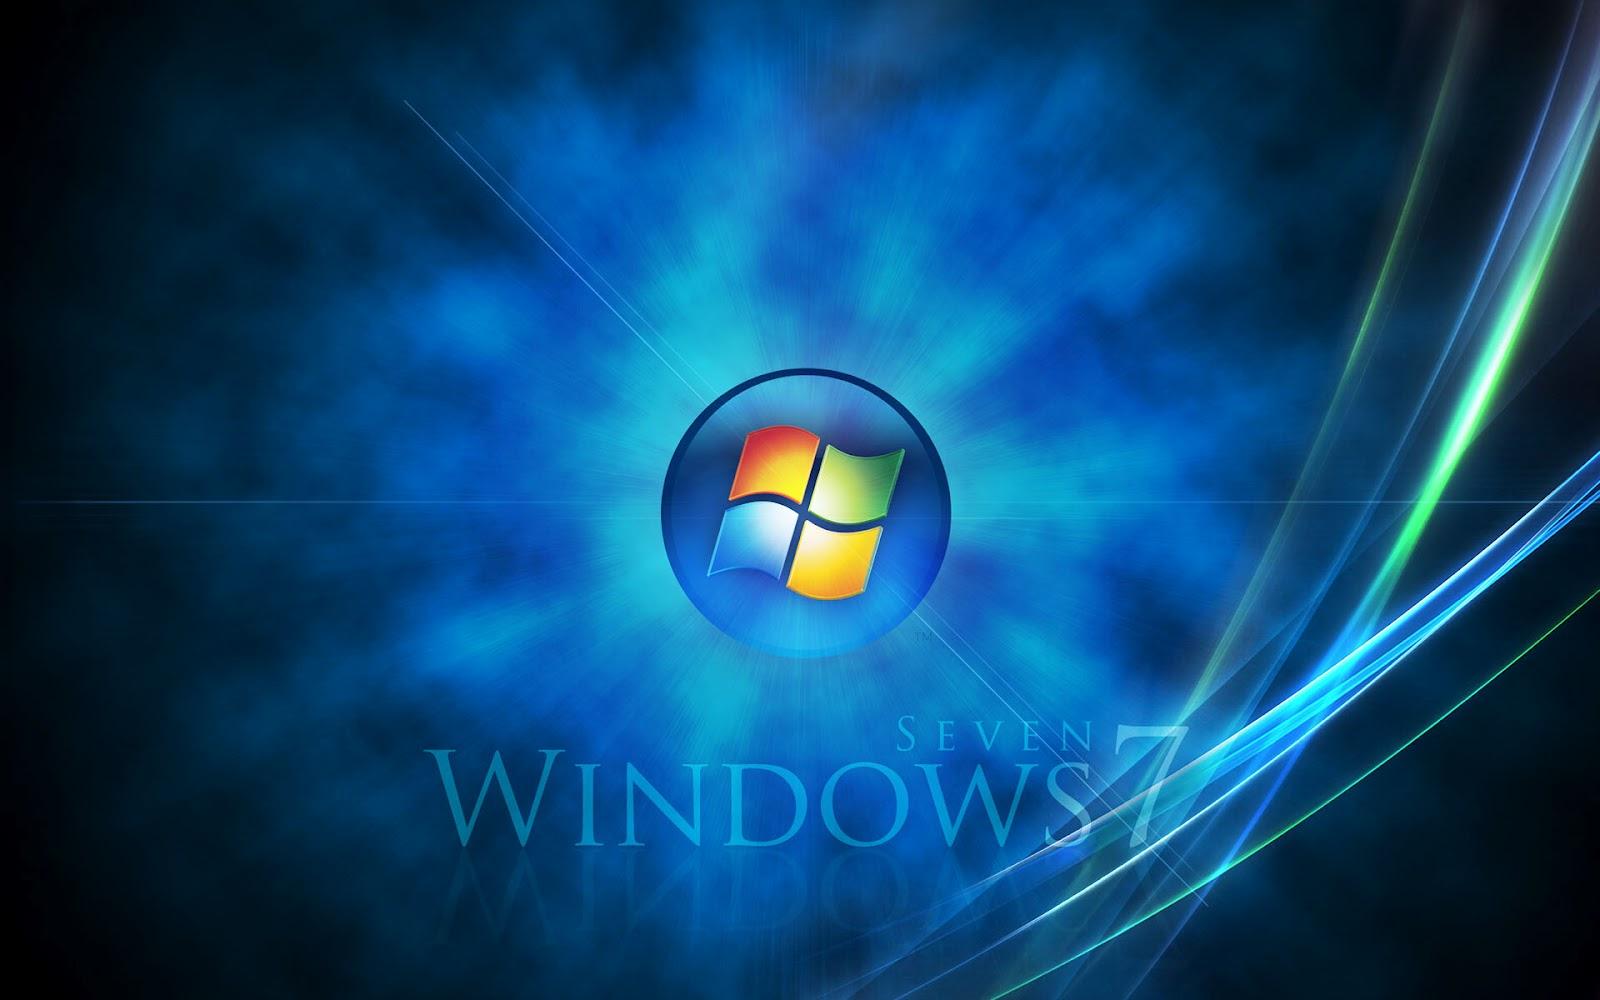 Windows 7 original wallpapers Windows 7 genuine wallpapers Windows 1600x1000